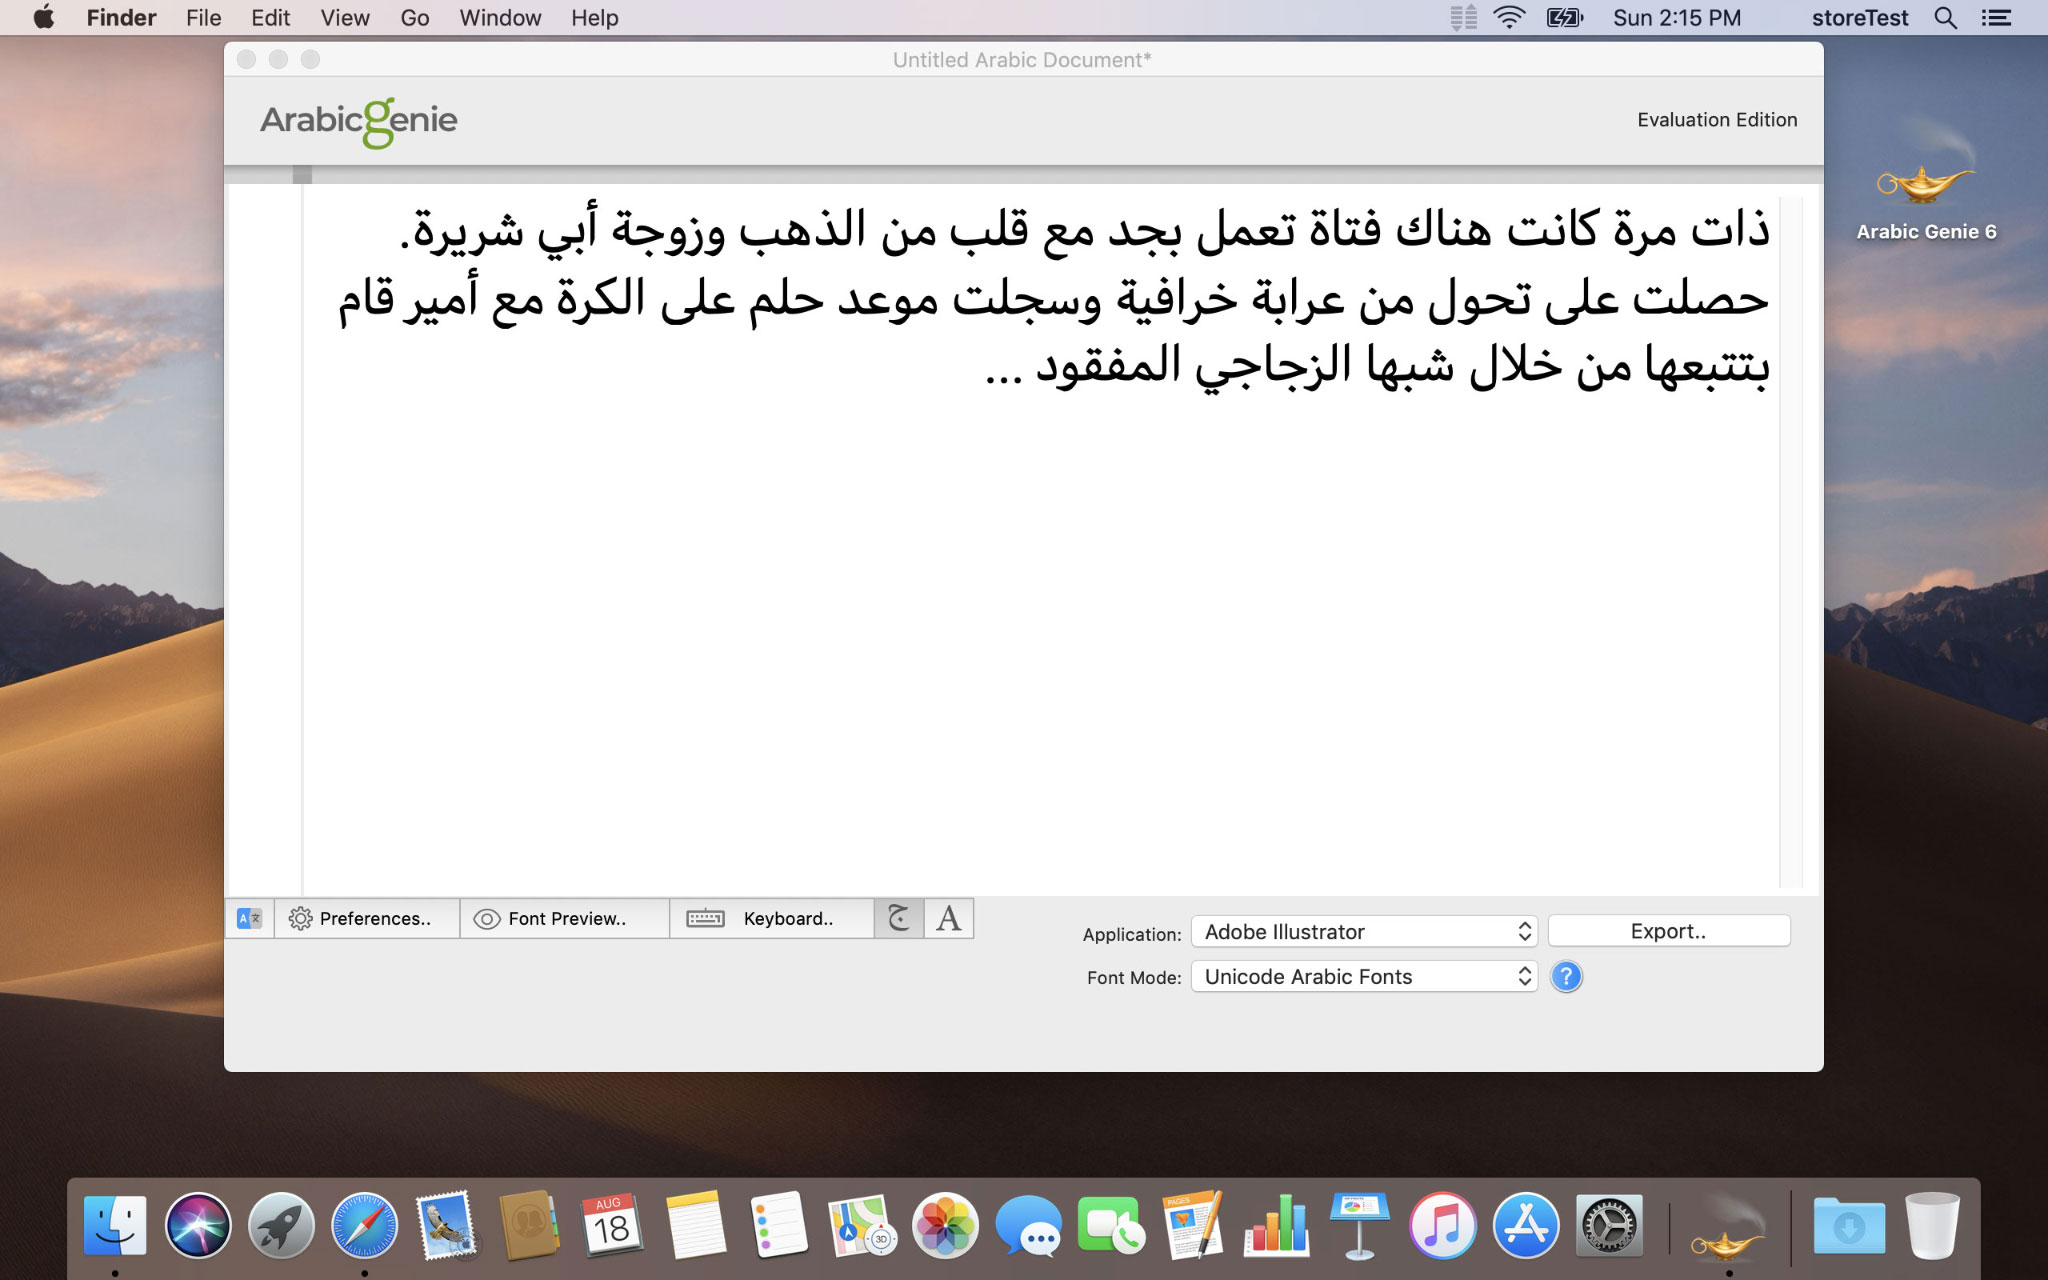 Arabic Fonts Pack Free Download For Windows 10 Arabic Fonts